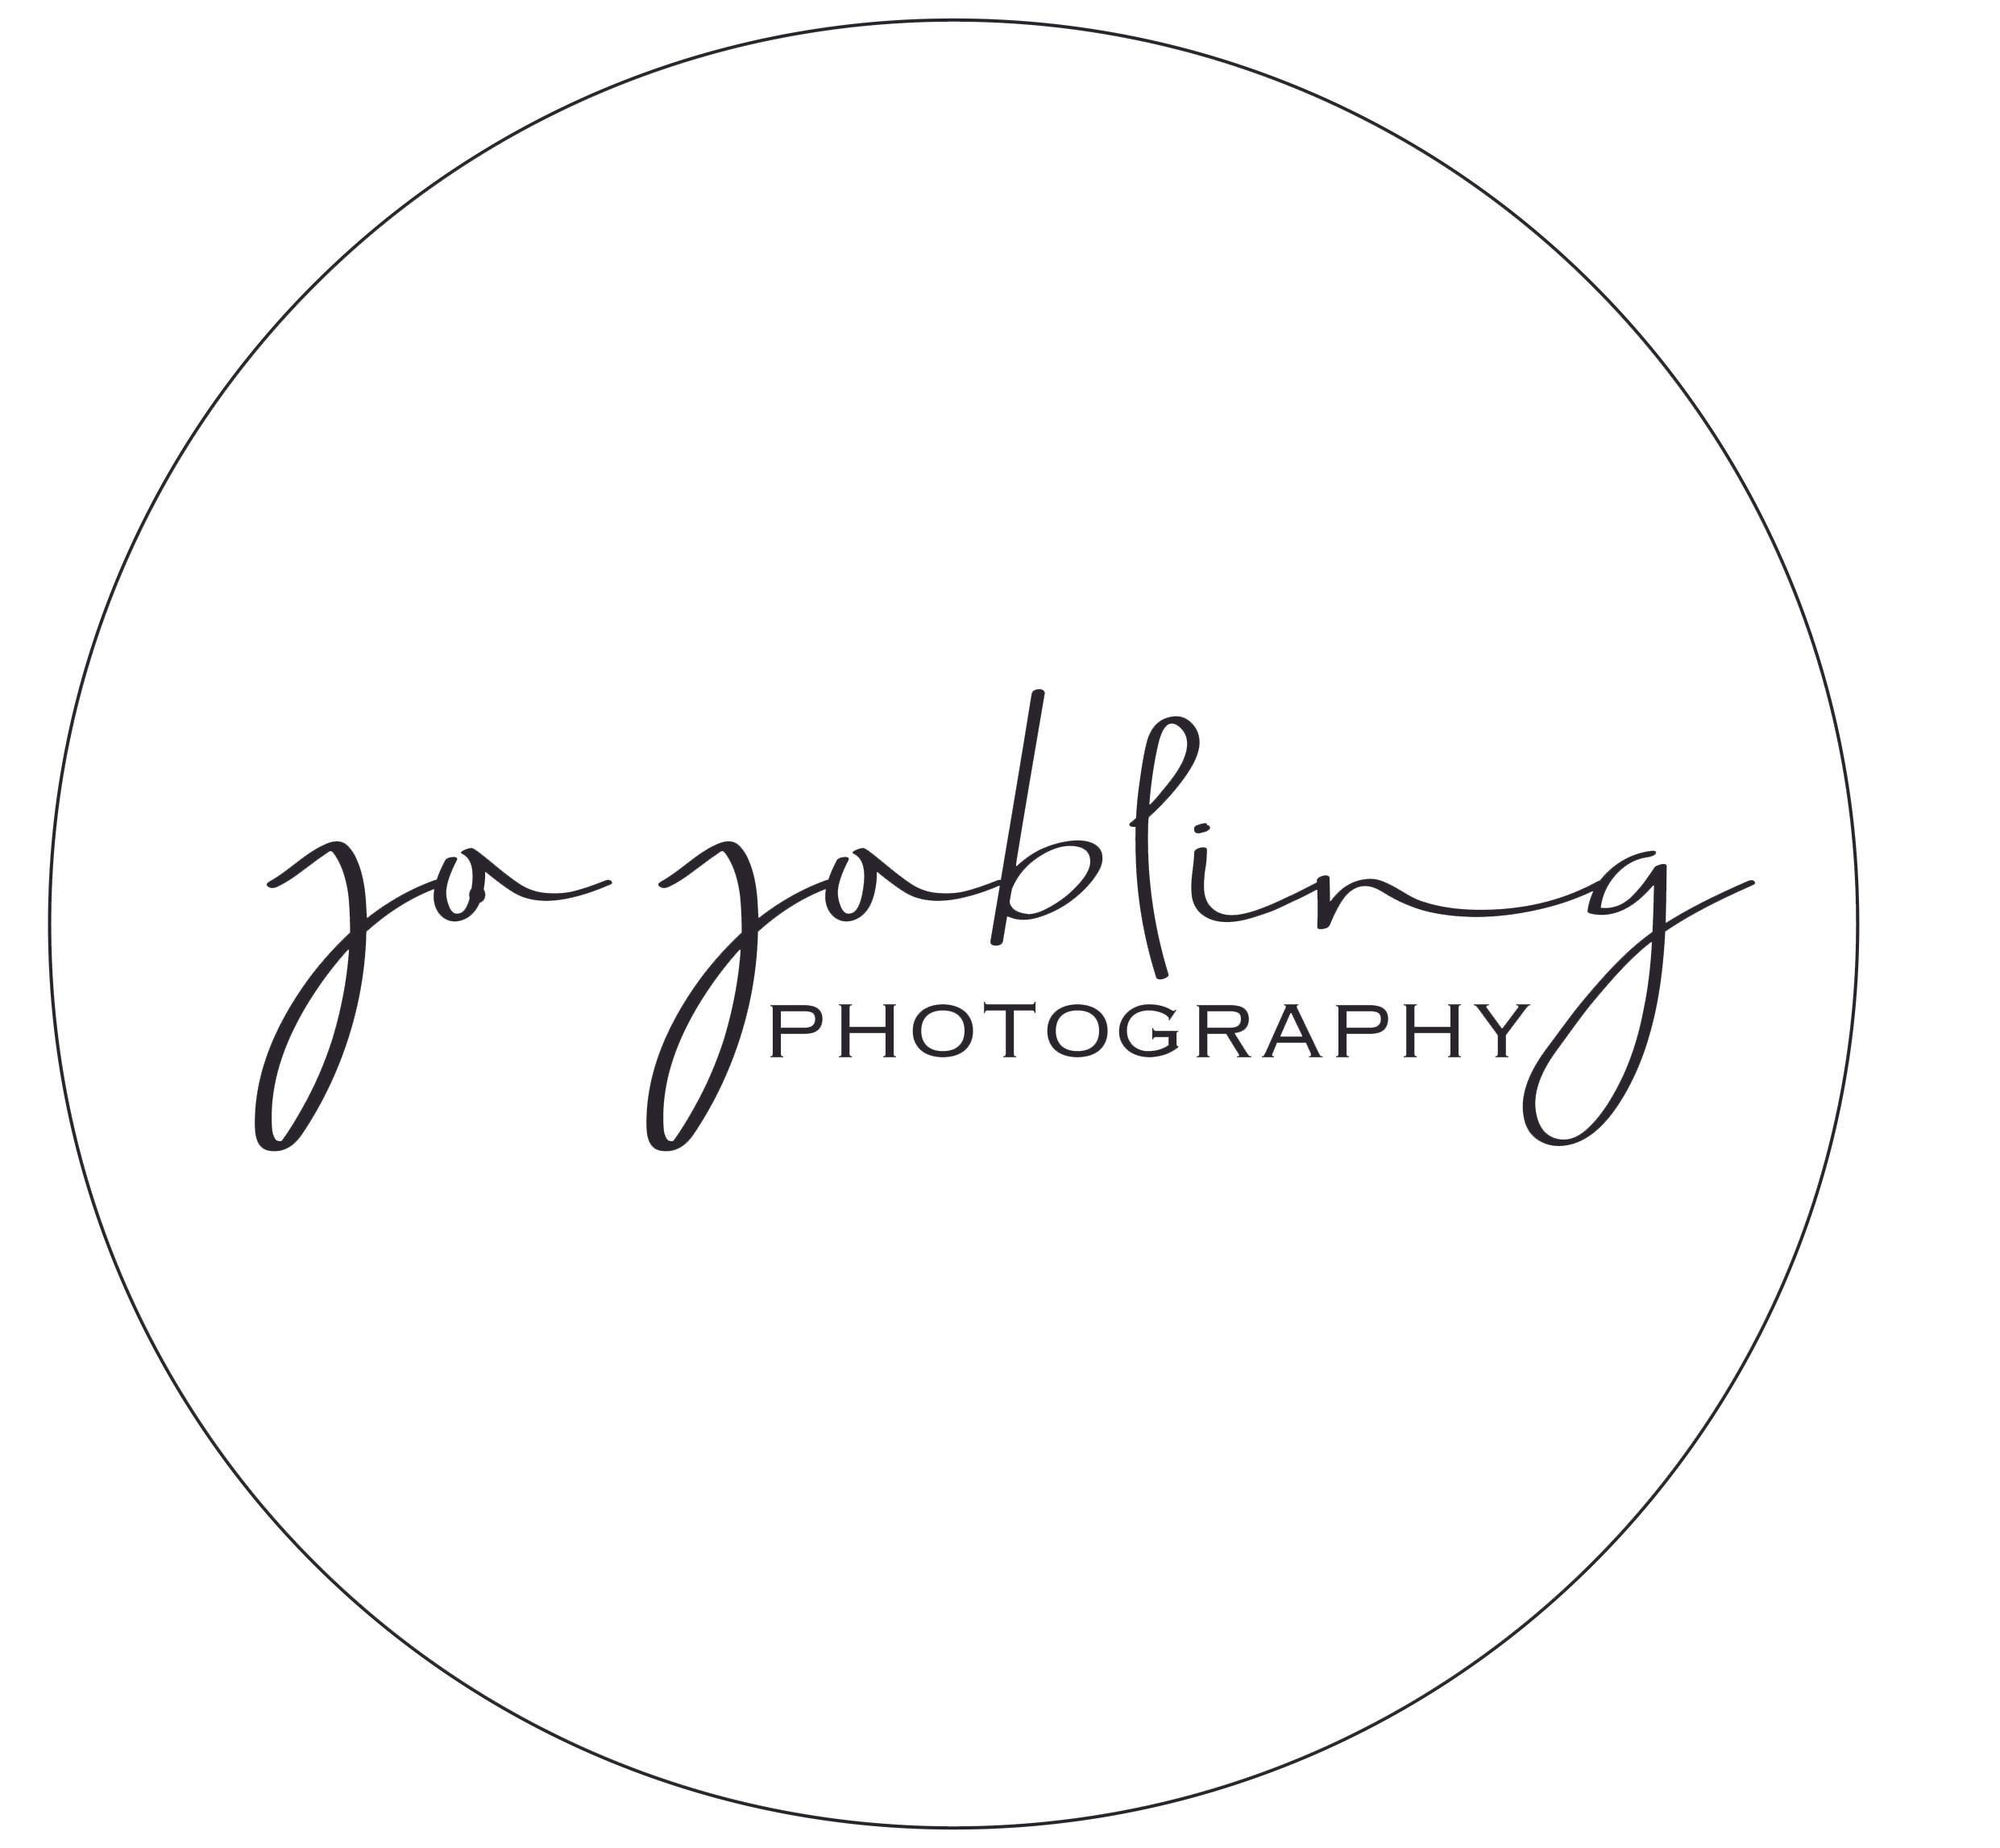 Jo Jobling Photography